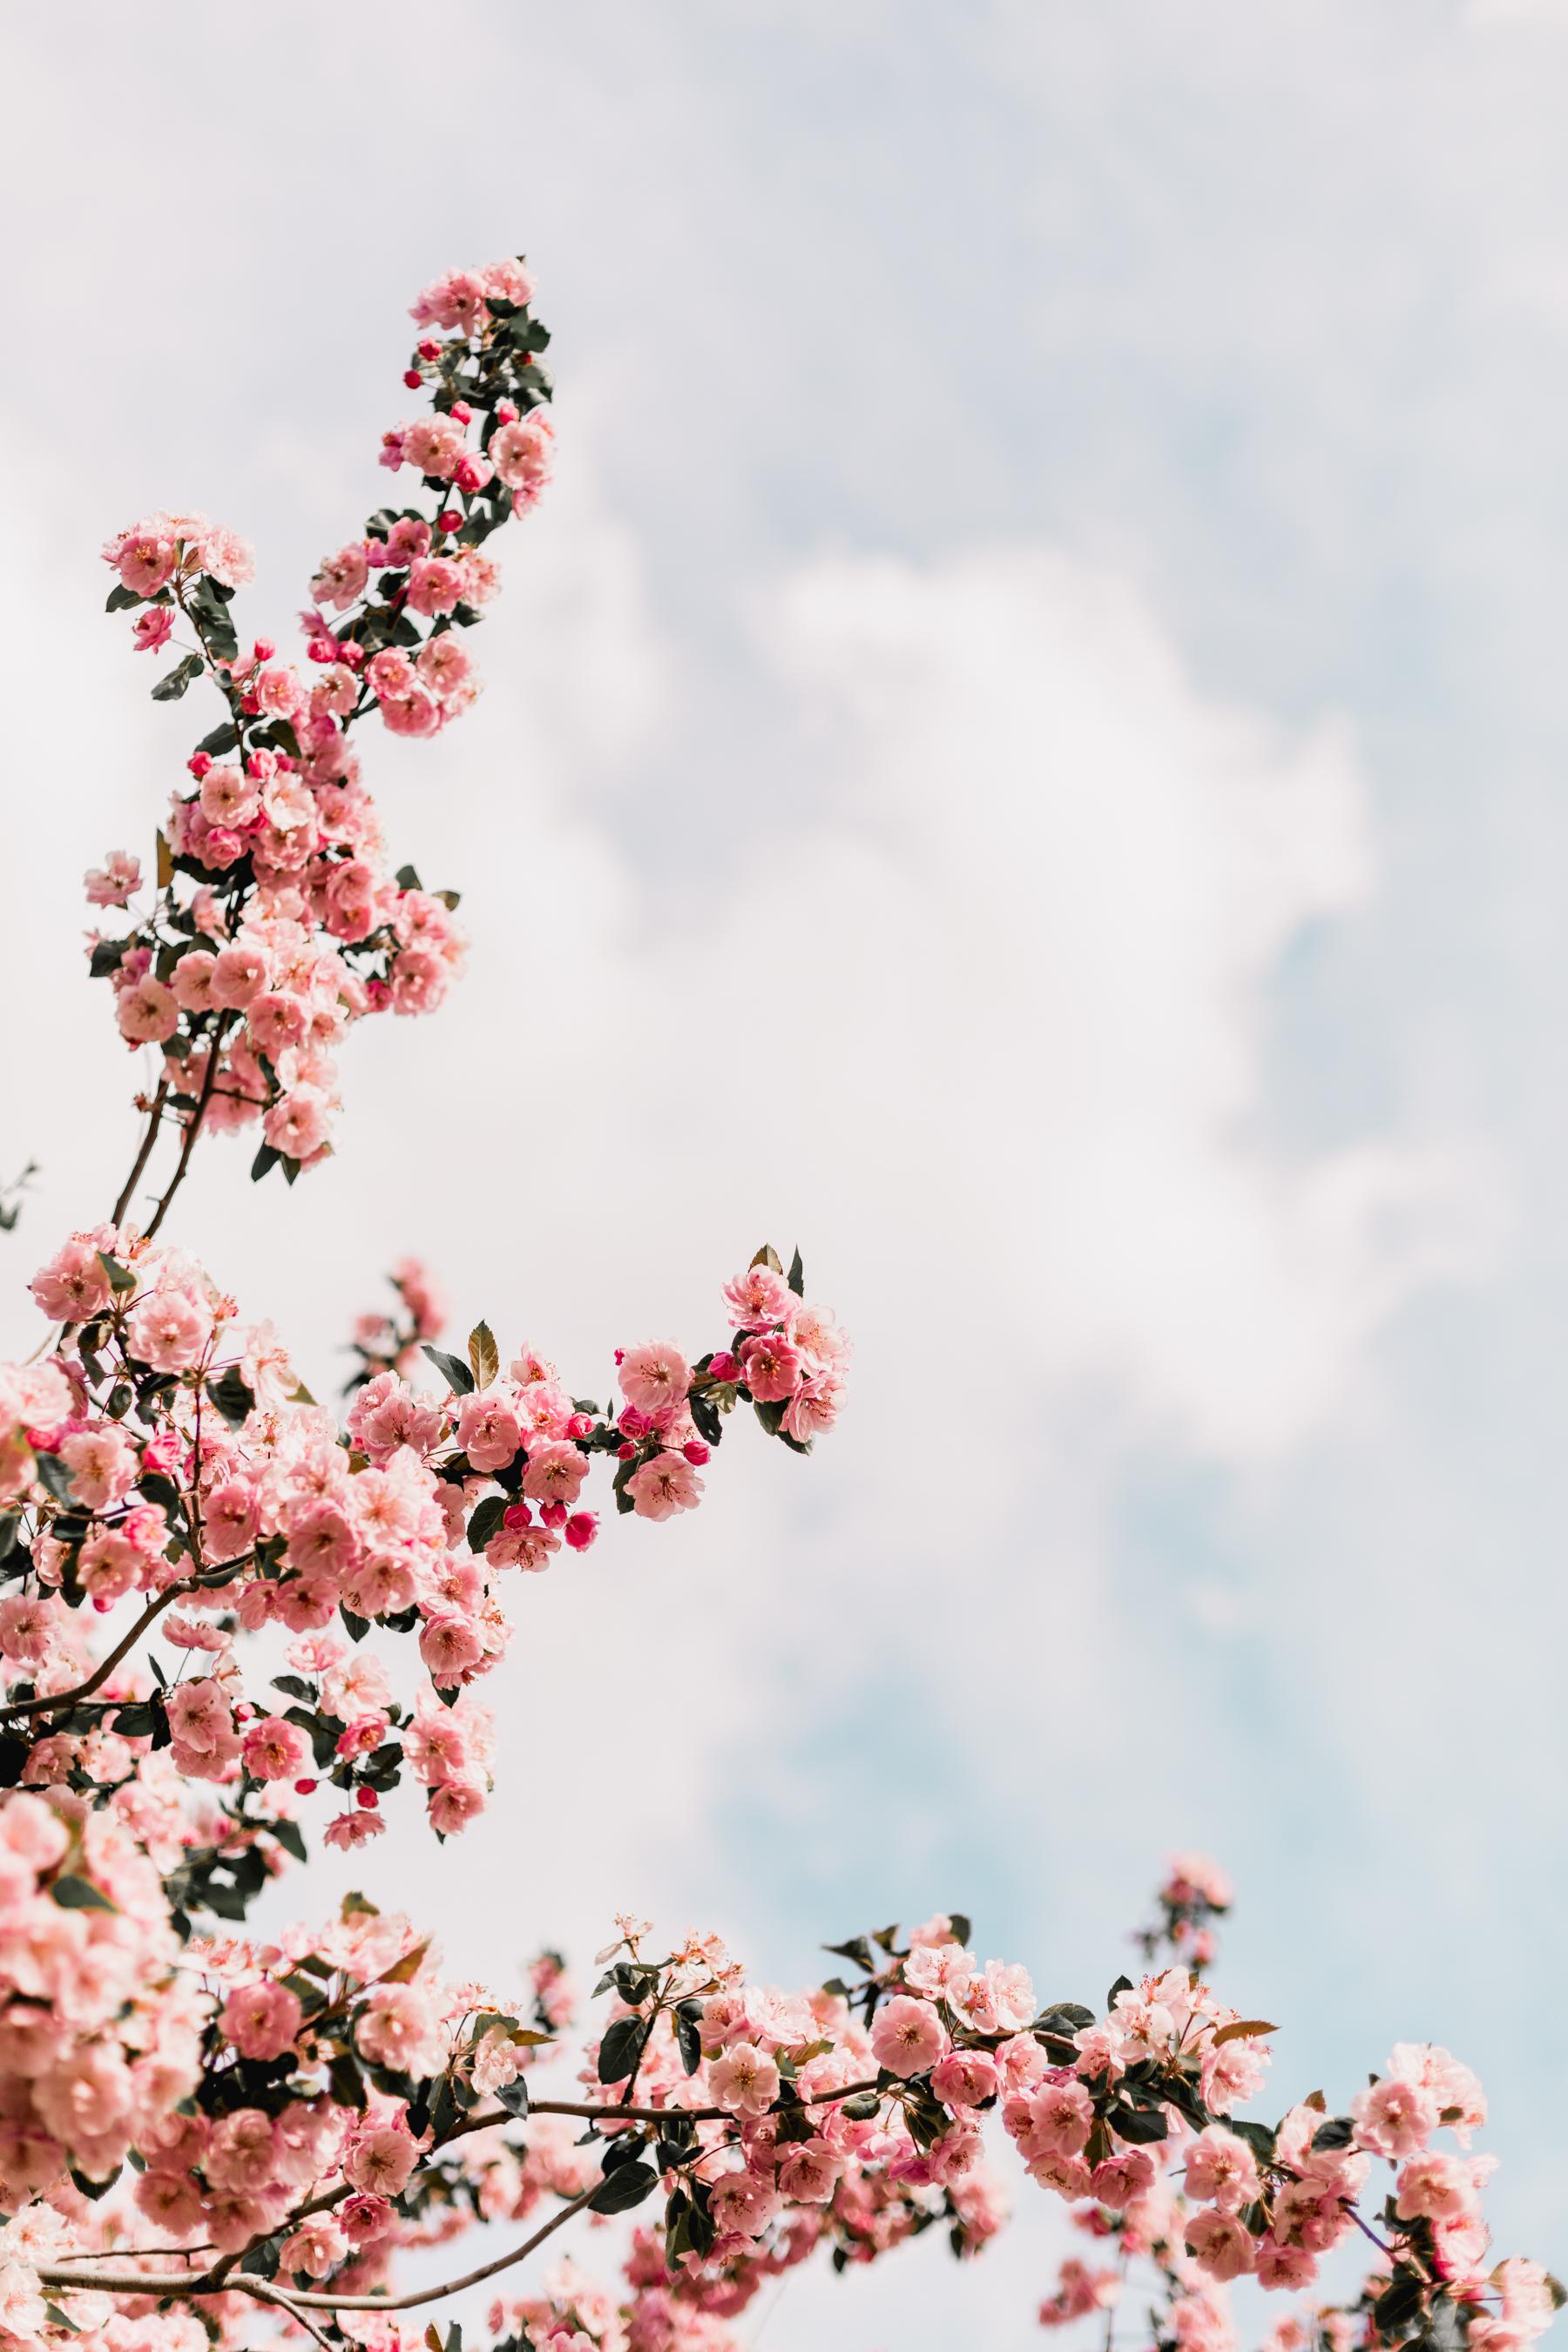 Blossoms-25.jpg